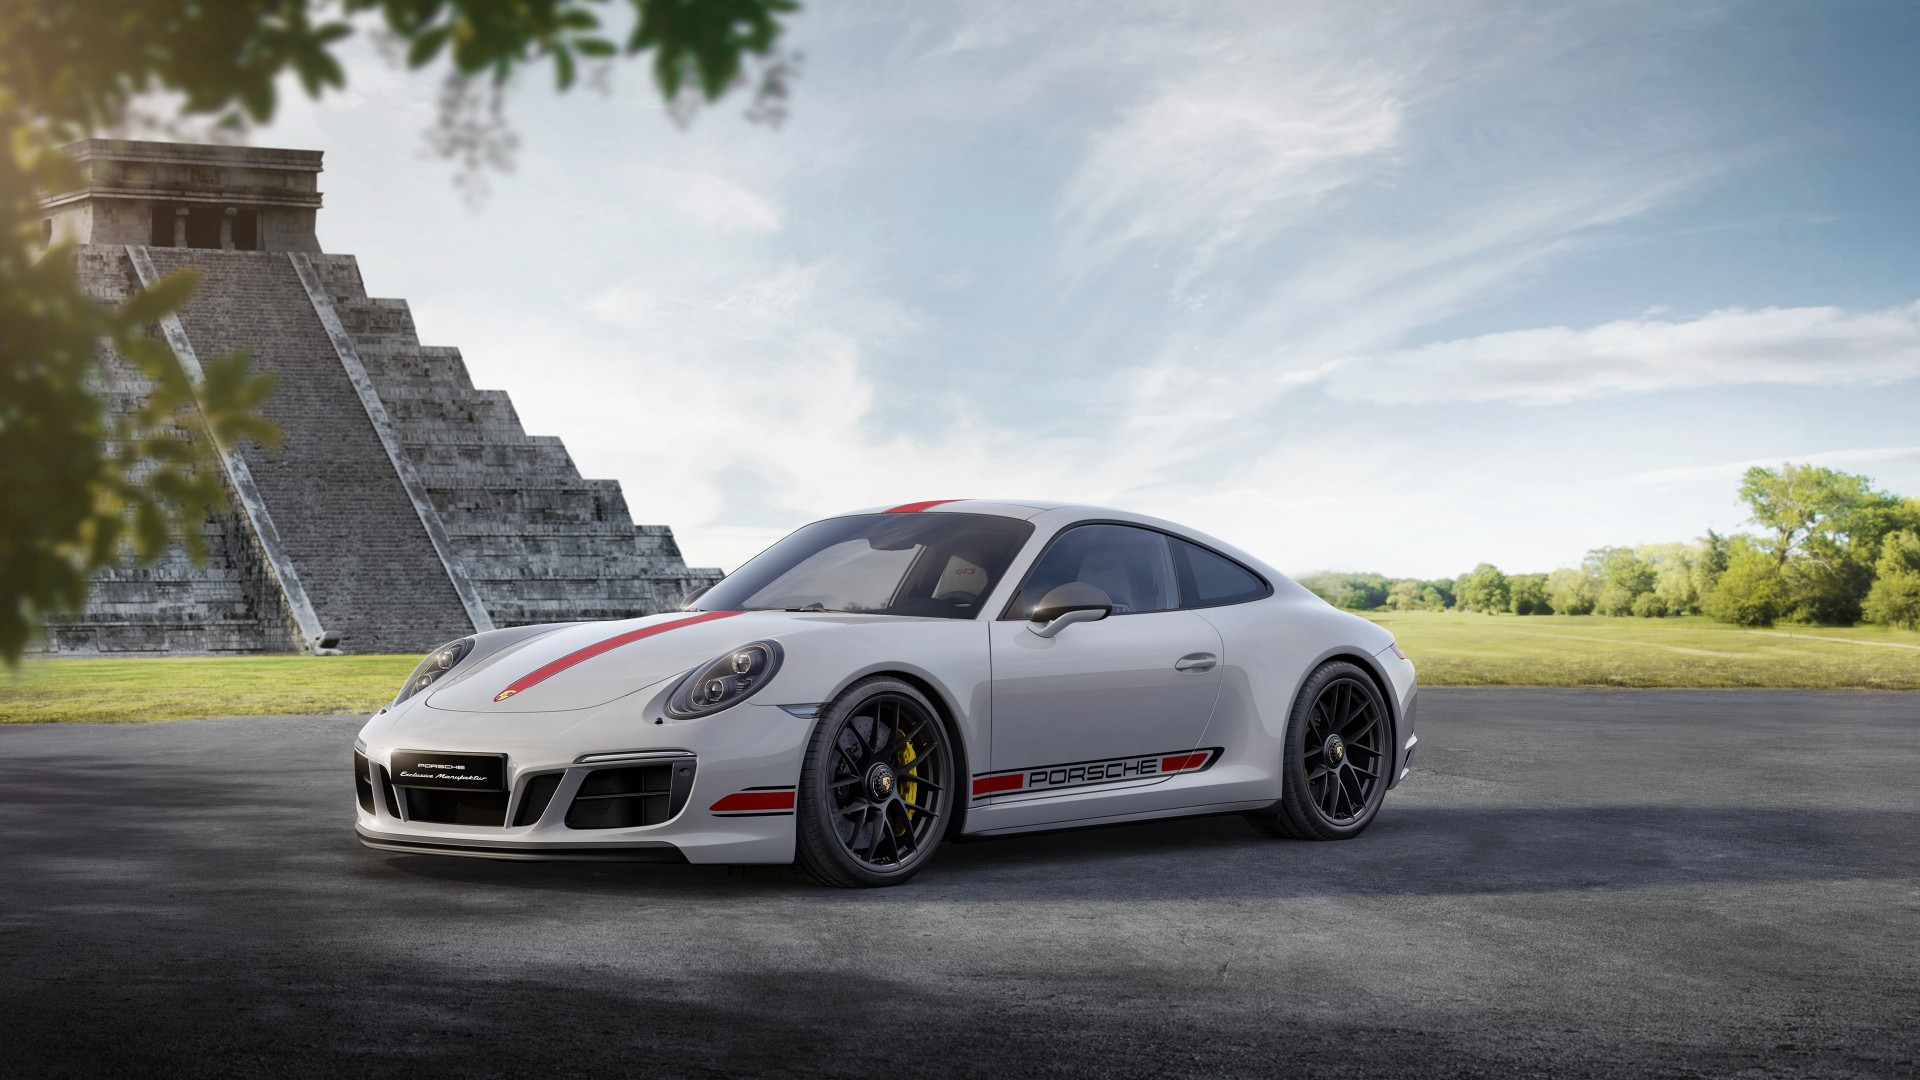 2017 Porsche Cayenne Gts >> 2017 Porsche 911 Carrera GTS Coupe 15 Years Porsche Mexico 4K Wallpaper | HD Car Wallpapers | ID ...